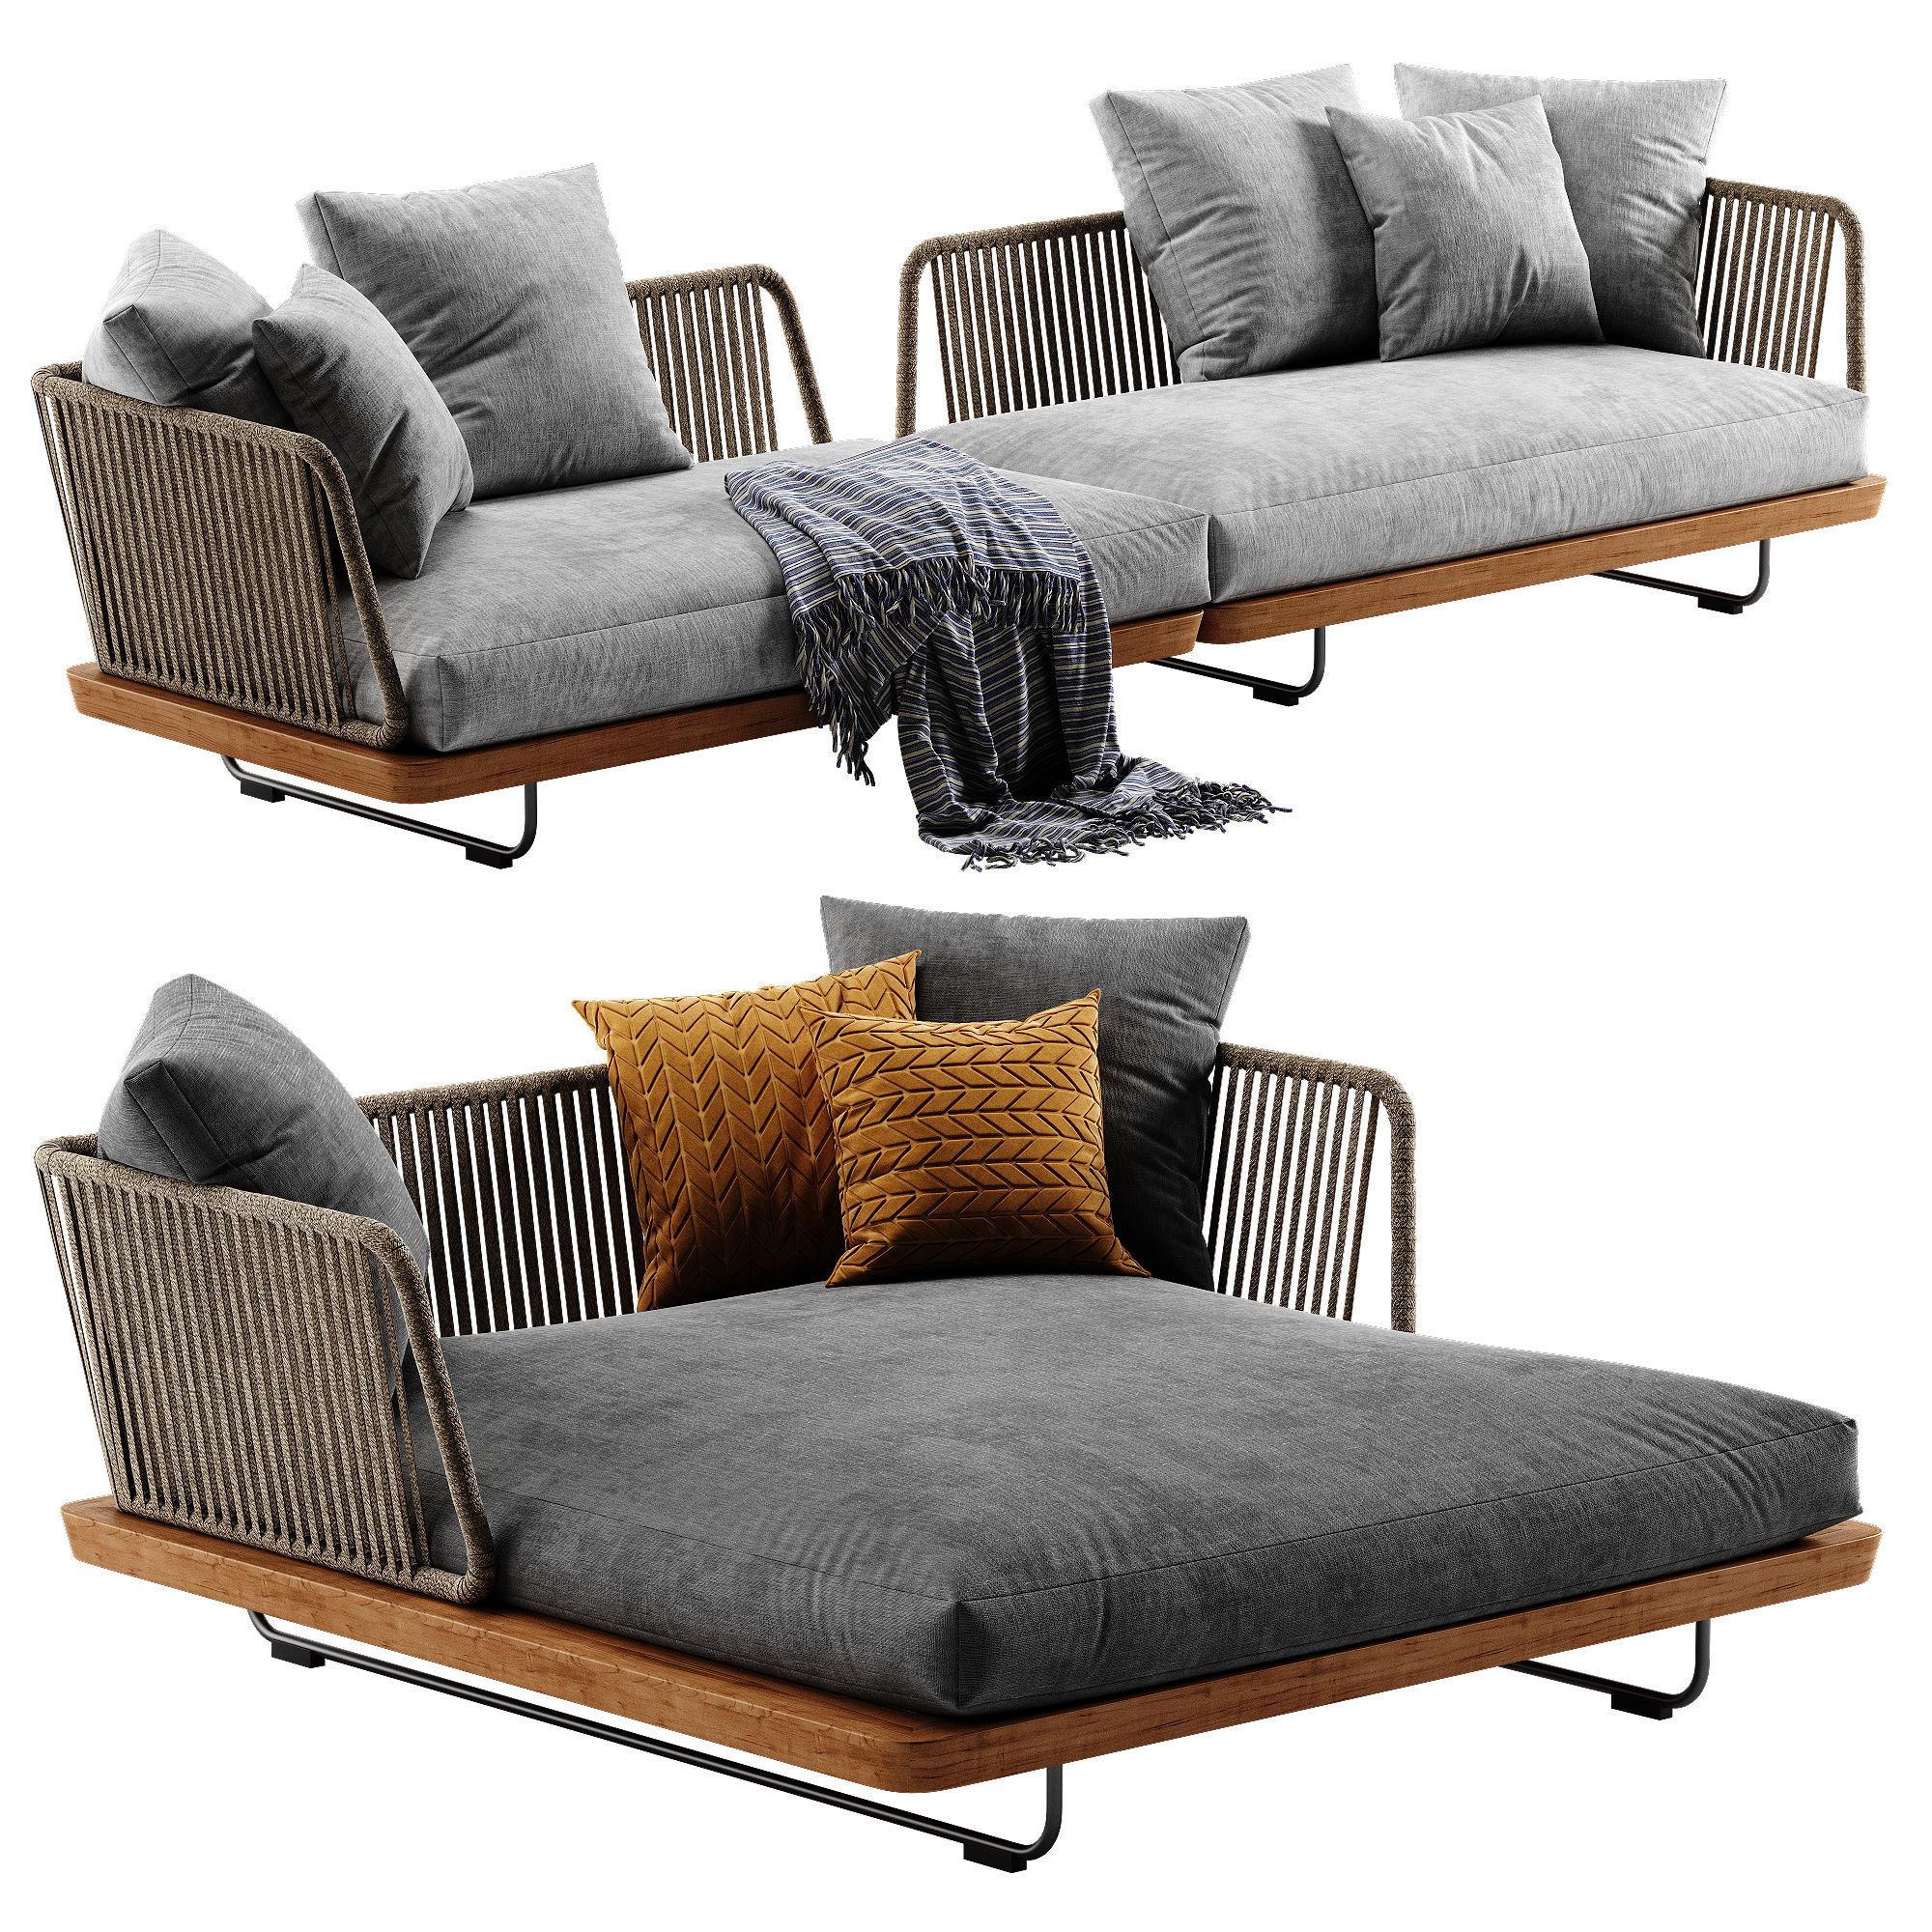 Minotti Sunray sofa set 3 3D | CGTrader